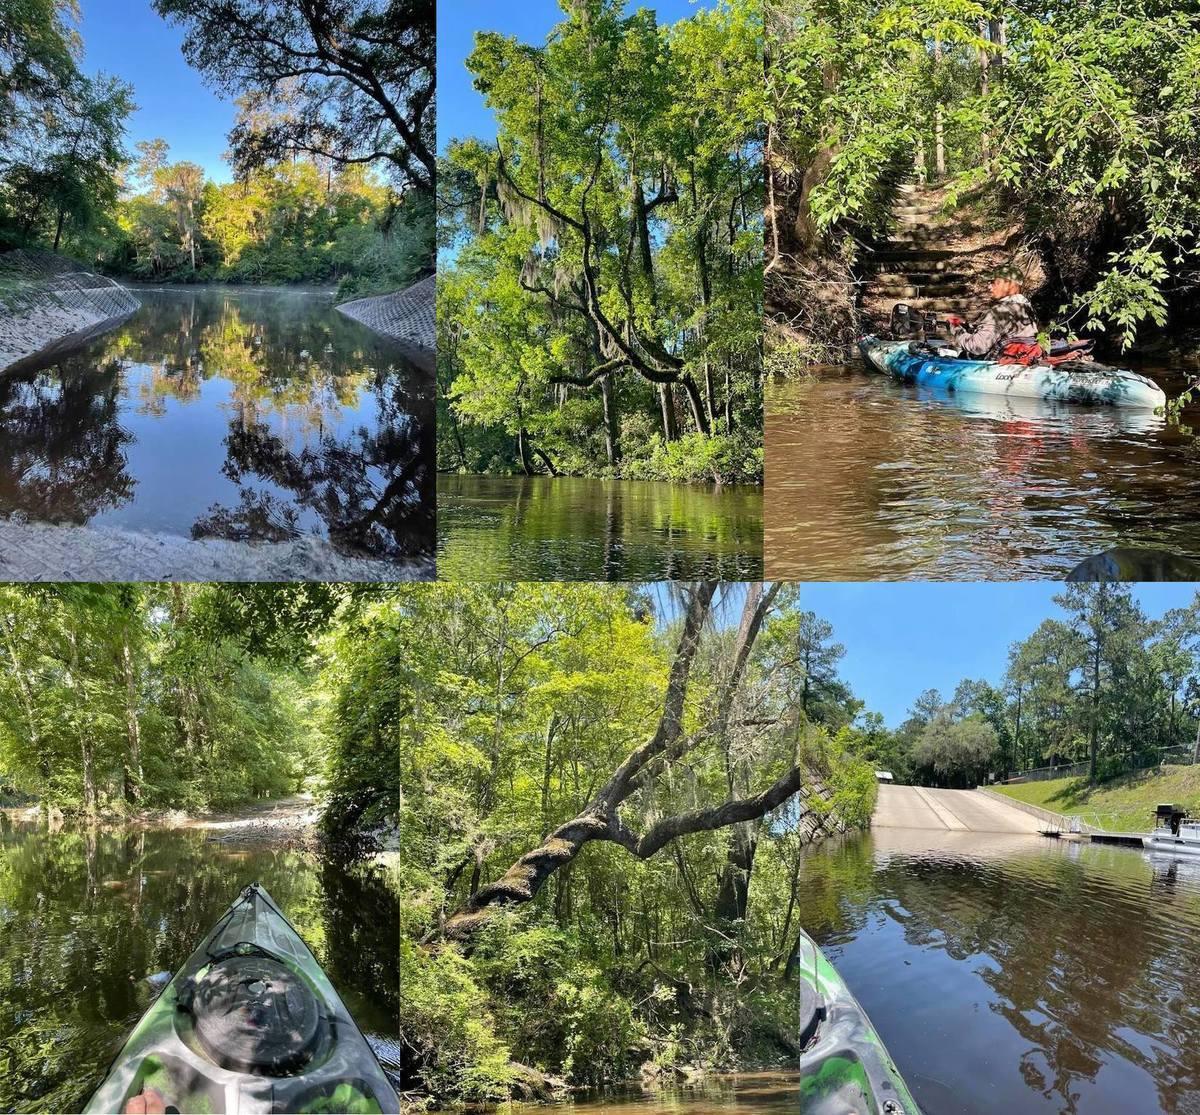 [Sasser Landing, sun tree, Jennings Bluff Landing, US 41 Alapaha River Landing, twisted tree, Gibson Park Boat Ramp]